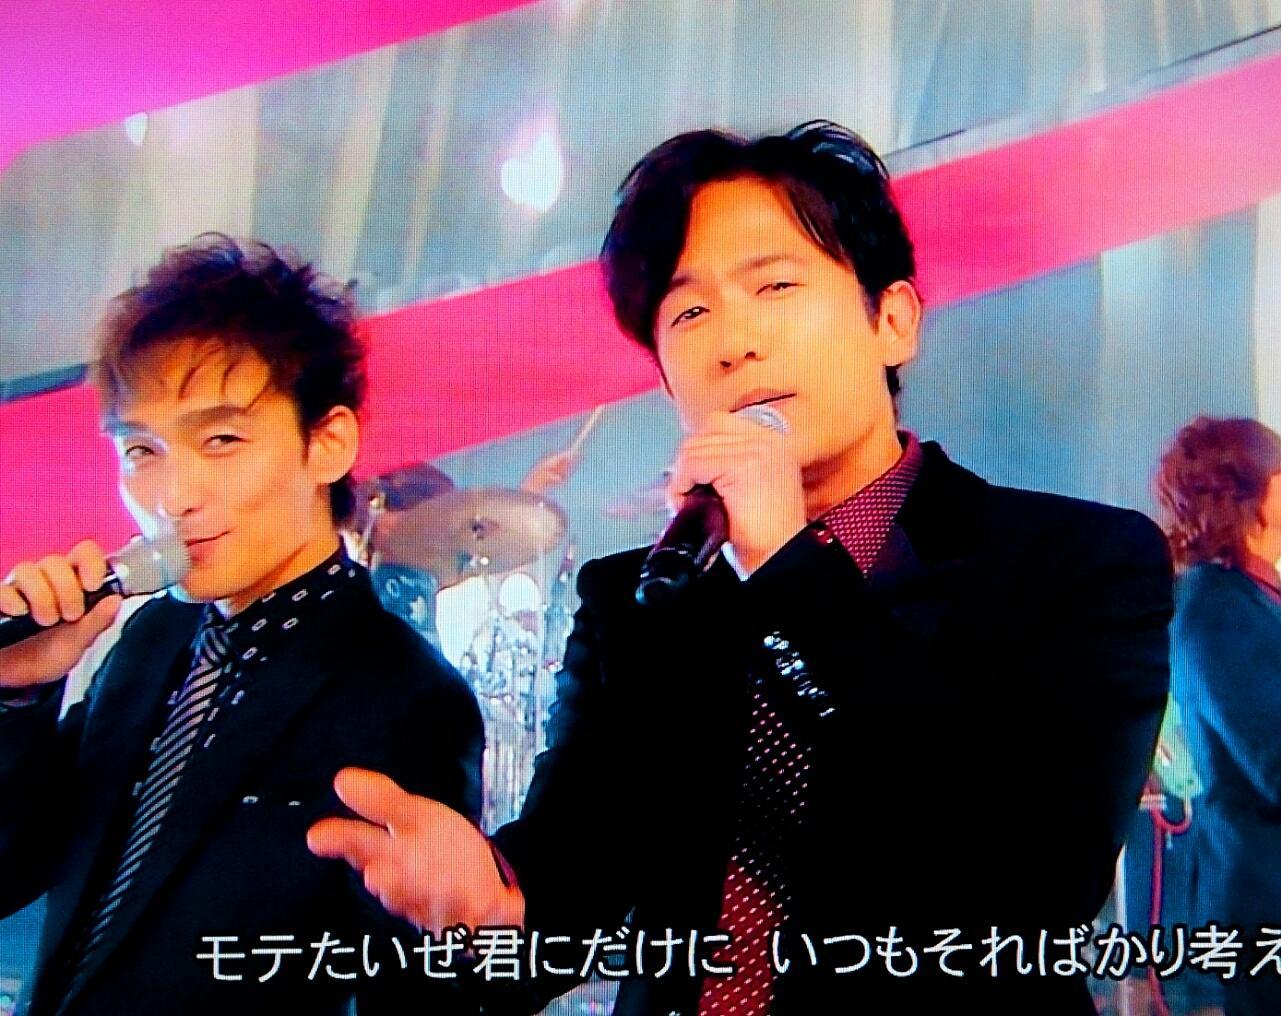 RT @T_hito1756: きゃ~ロハス! http://t.co/pfq7FW0cFt